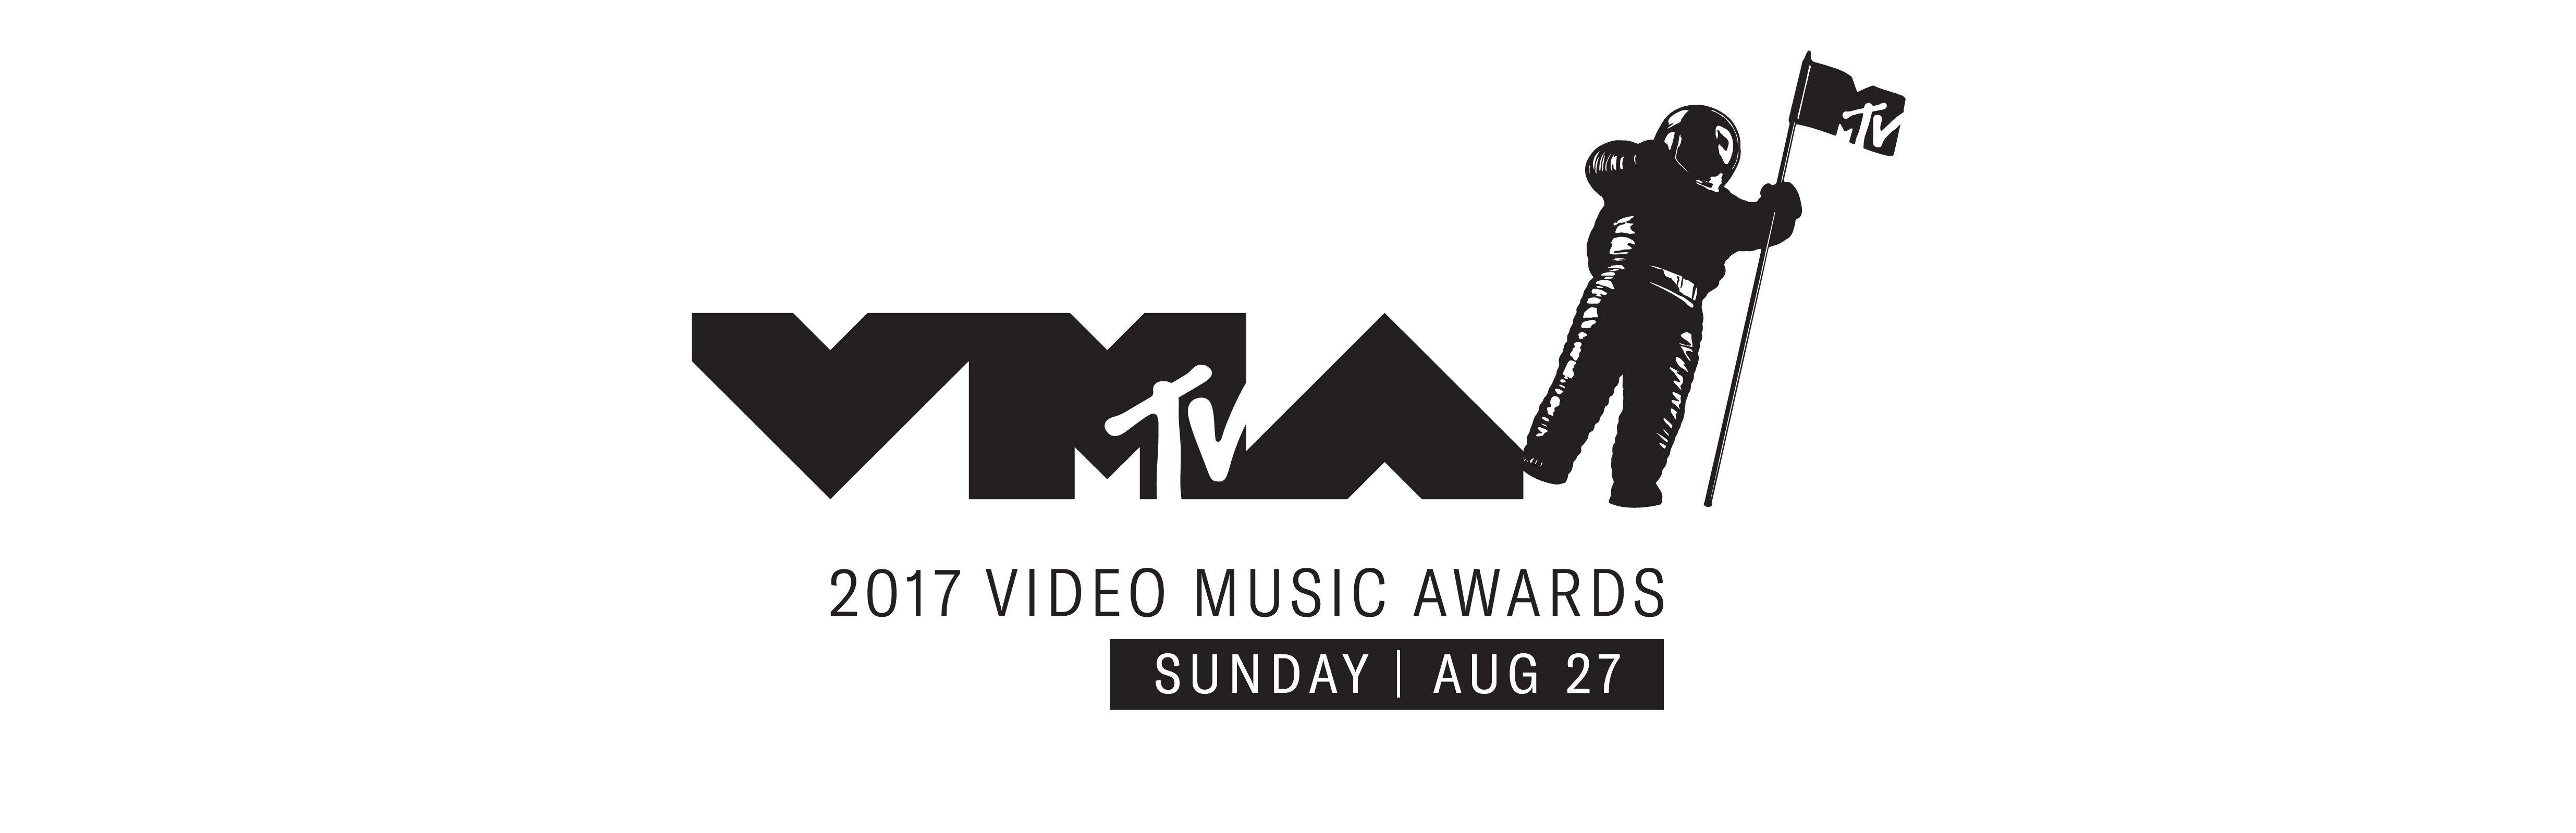 MTV_VMA_041917-B-0221_homepage_carousel.